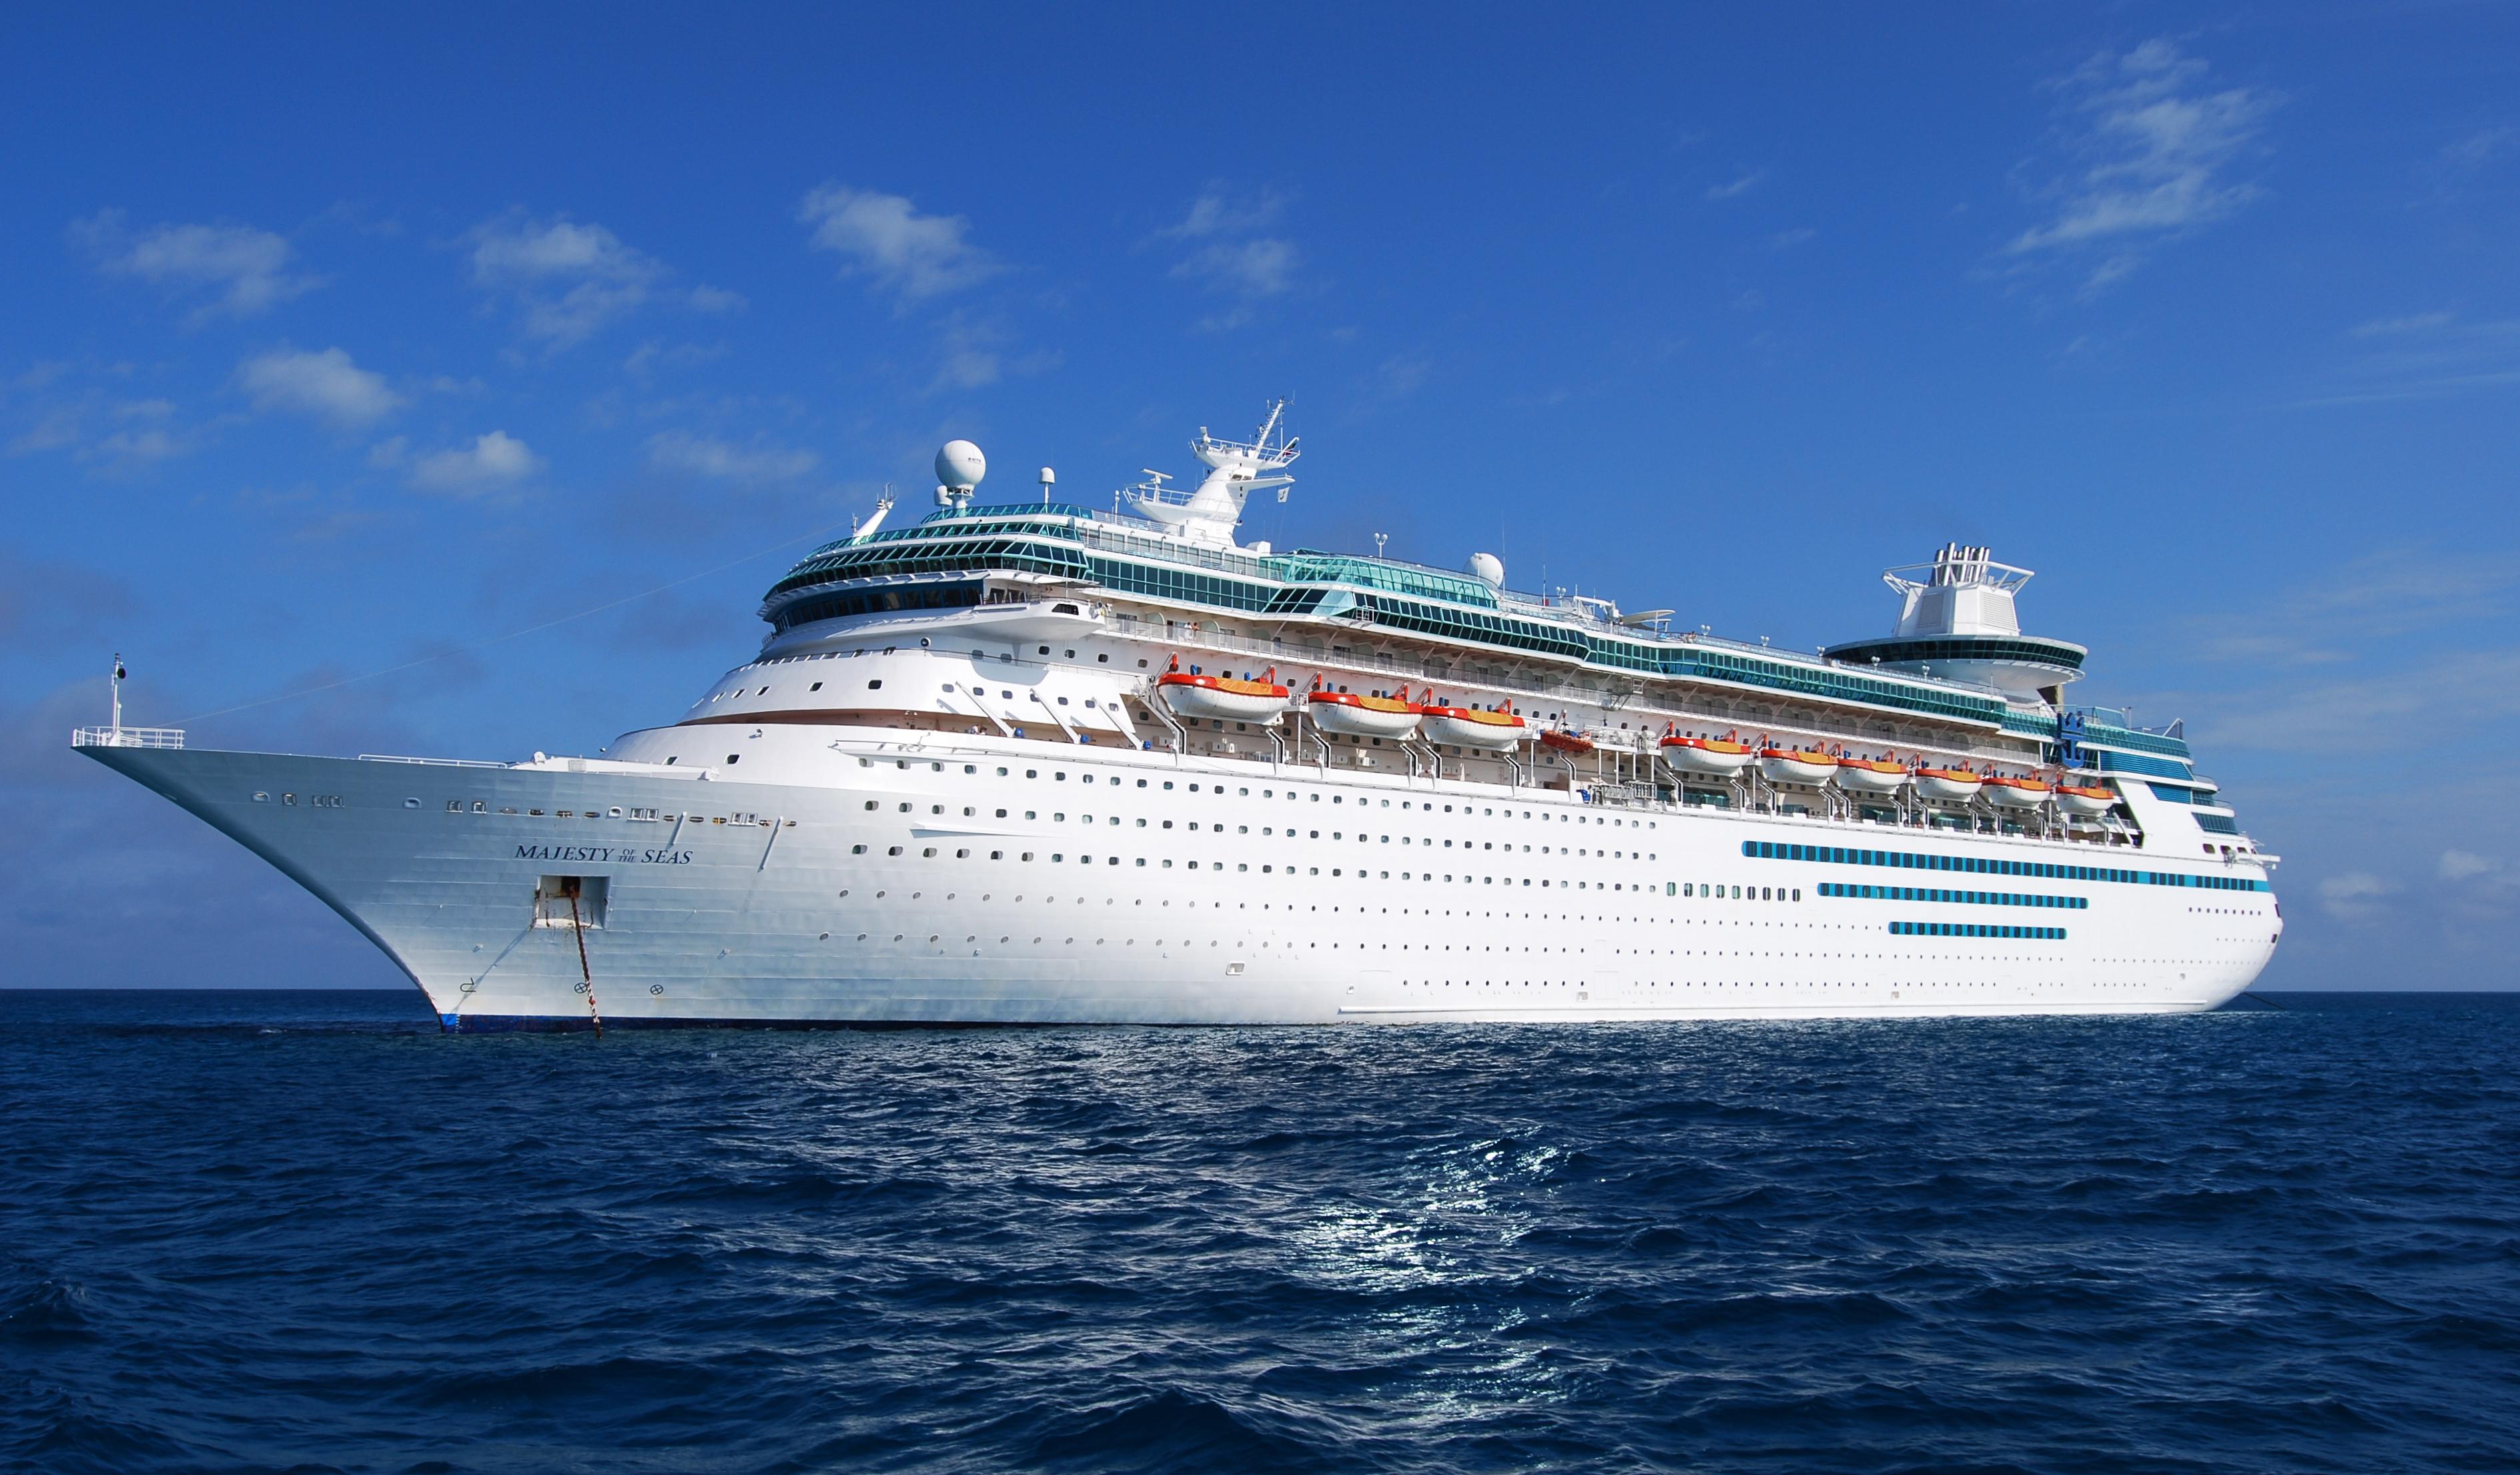 Majesty of the Seas cruise ship. (Matt H. Wade/CC-BY-SA-3.0)